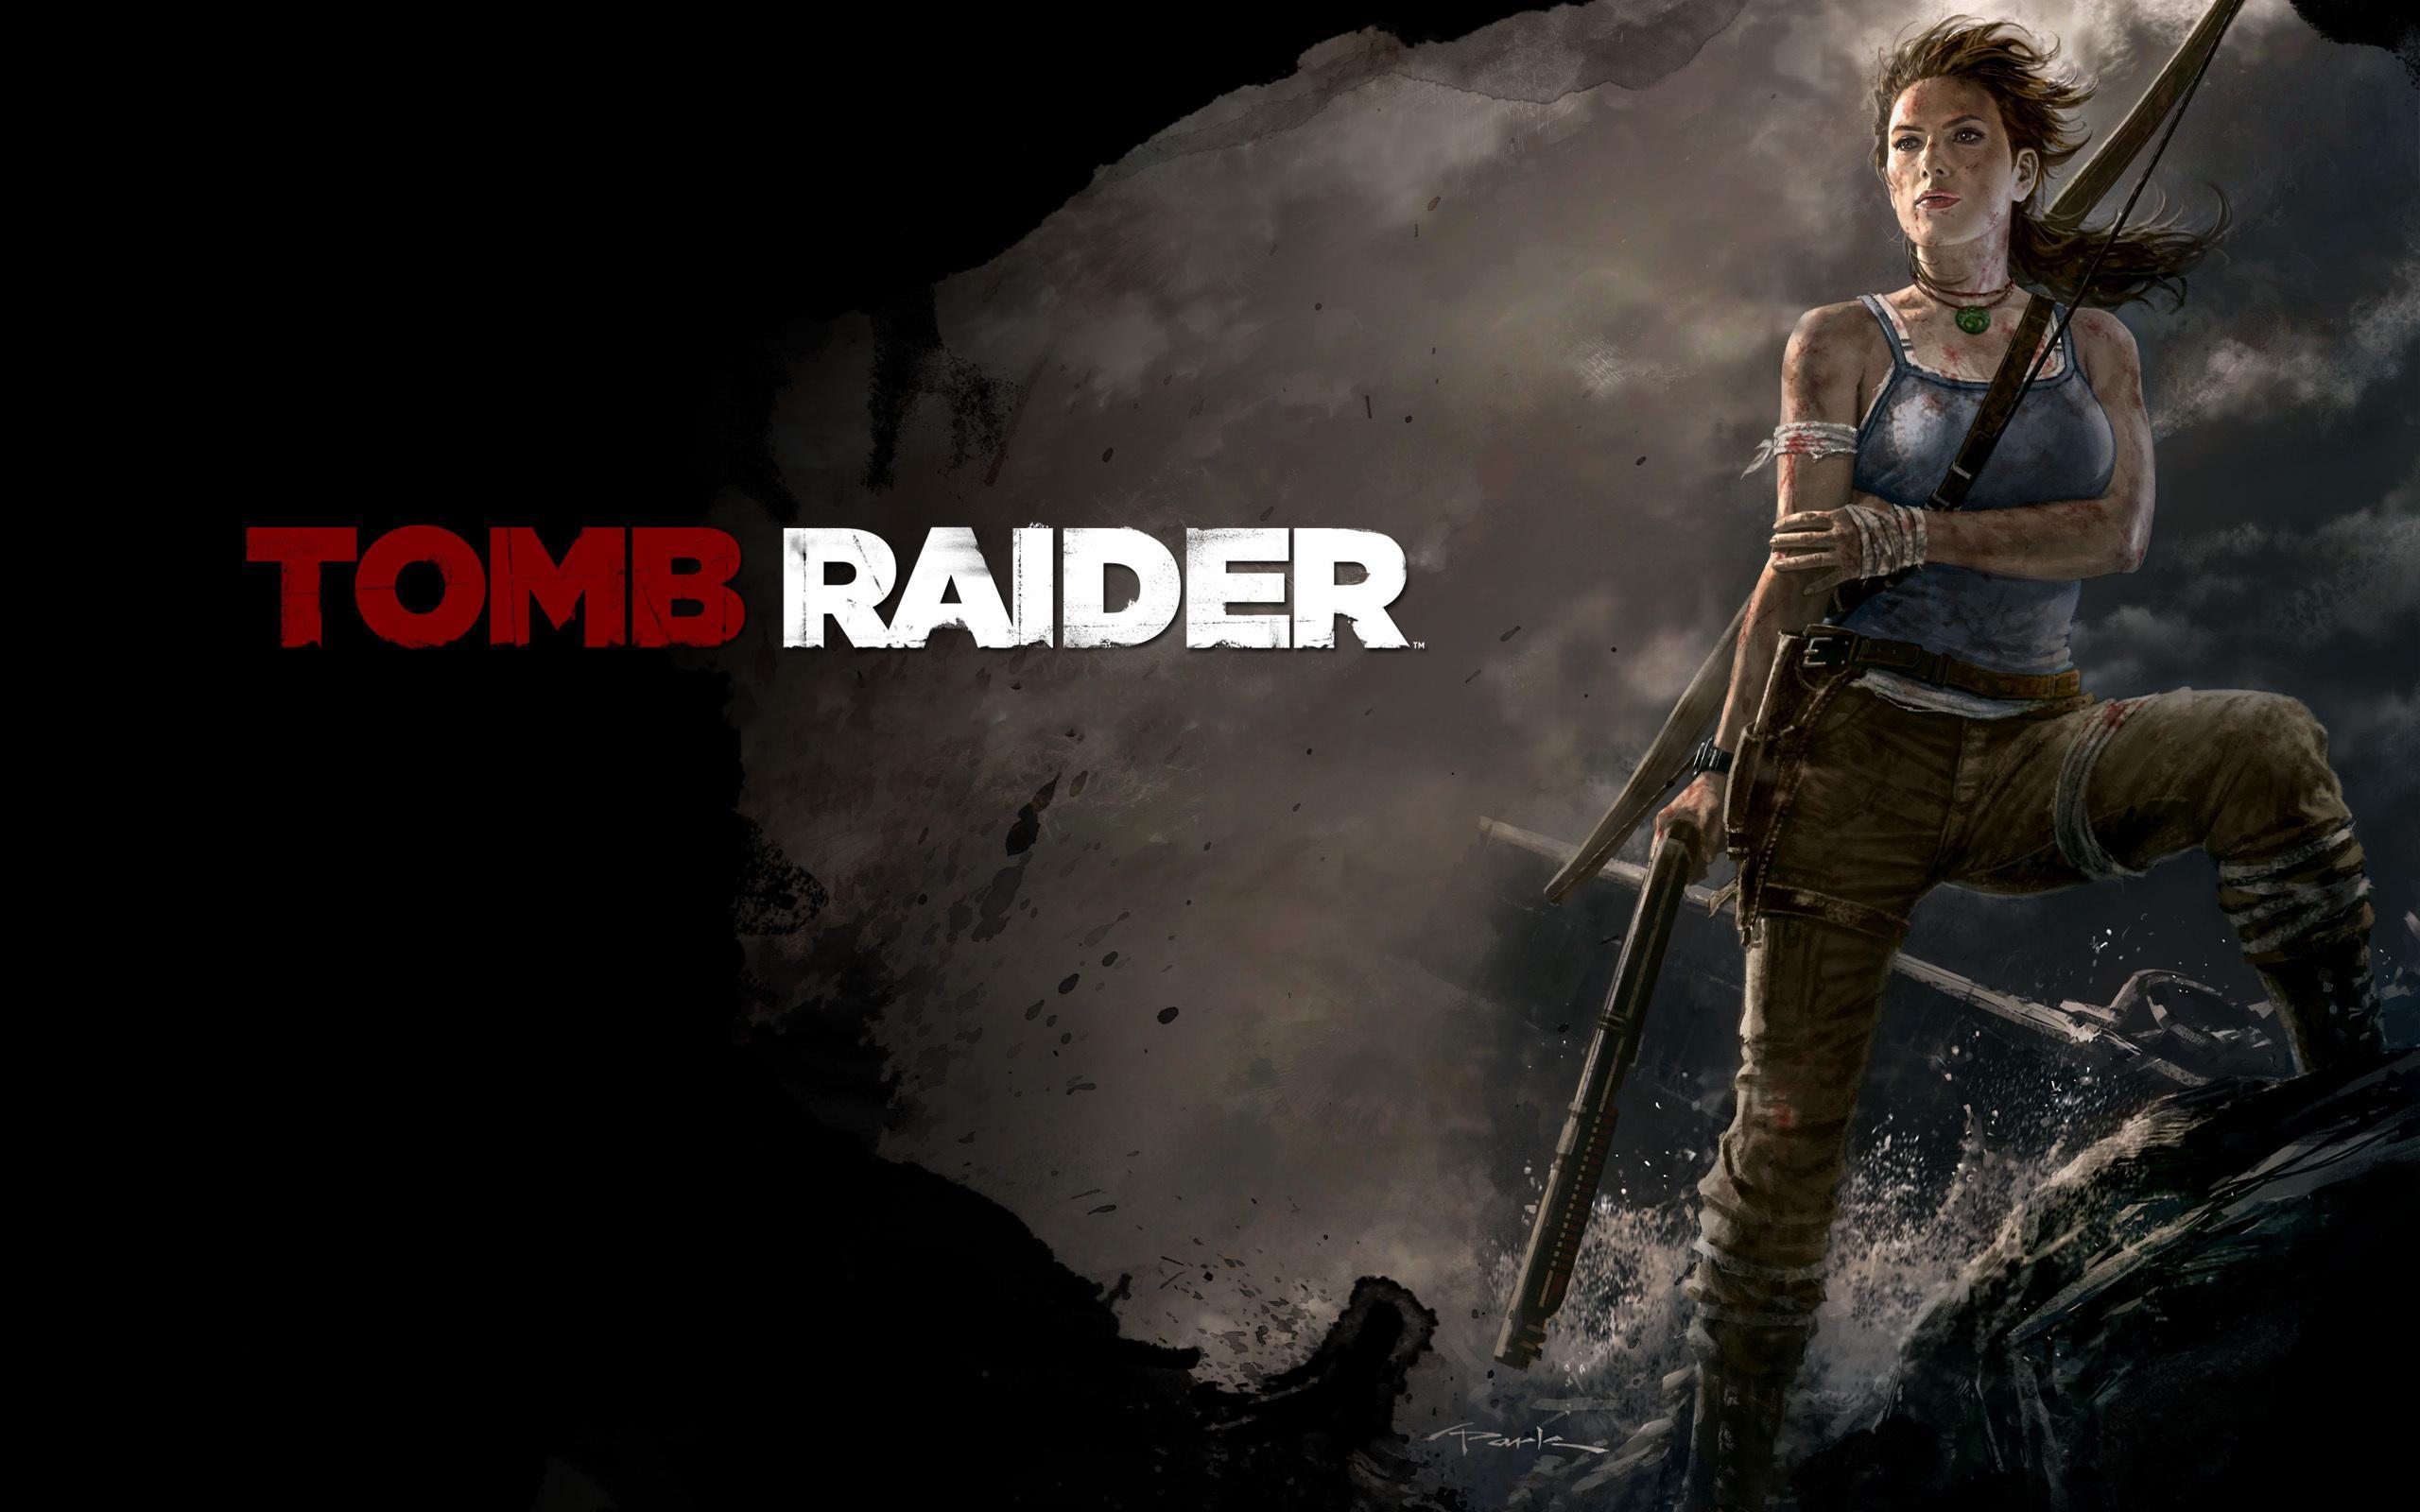 Tomb Raider 2013 video game Wallpaper 6 2560x1600